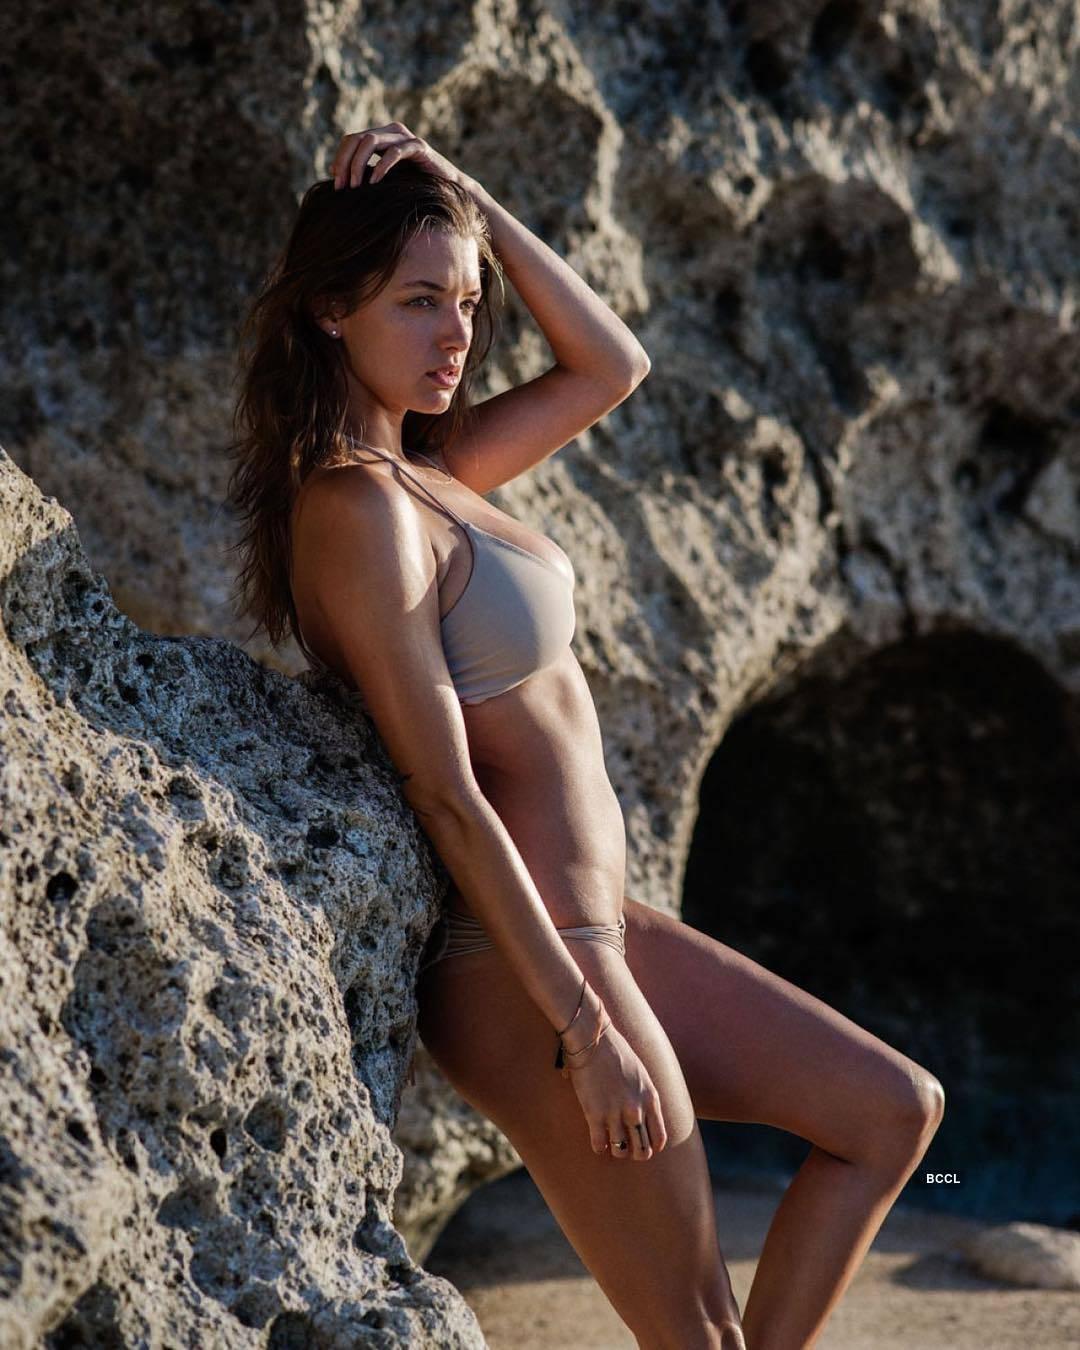 American model Alyssa Arce has flawless skin